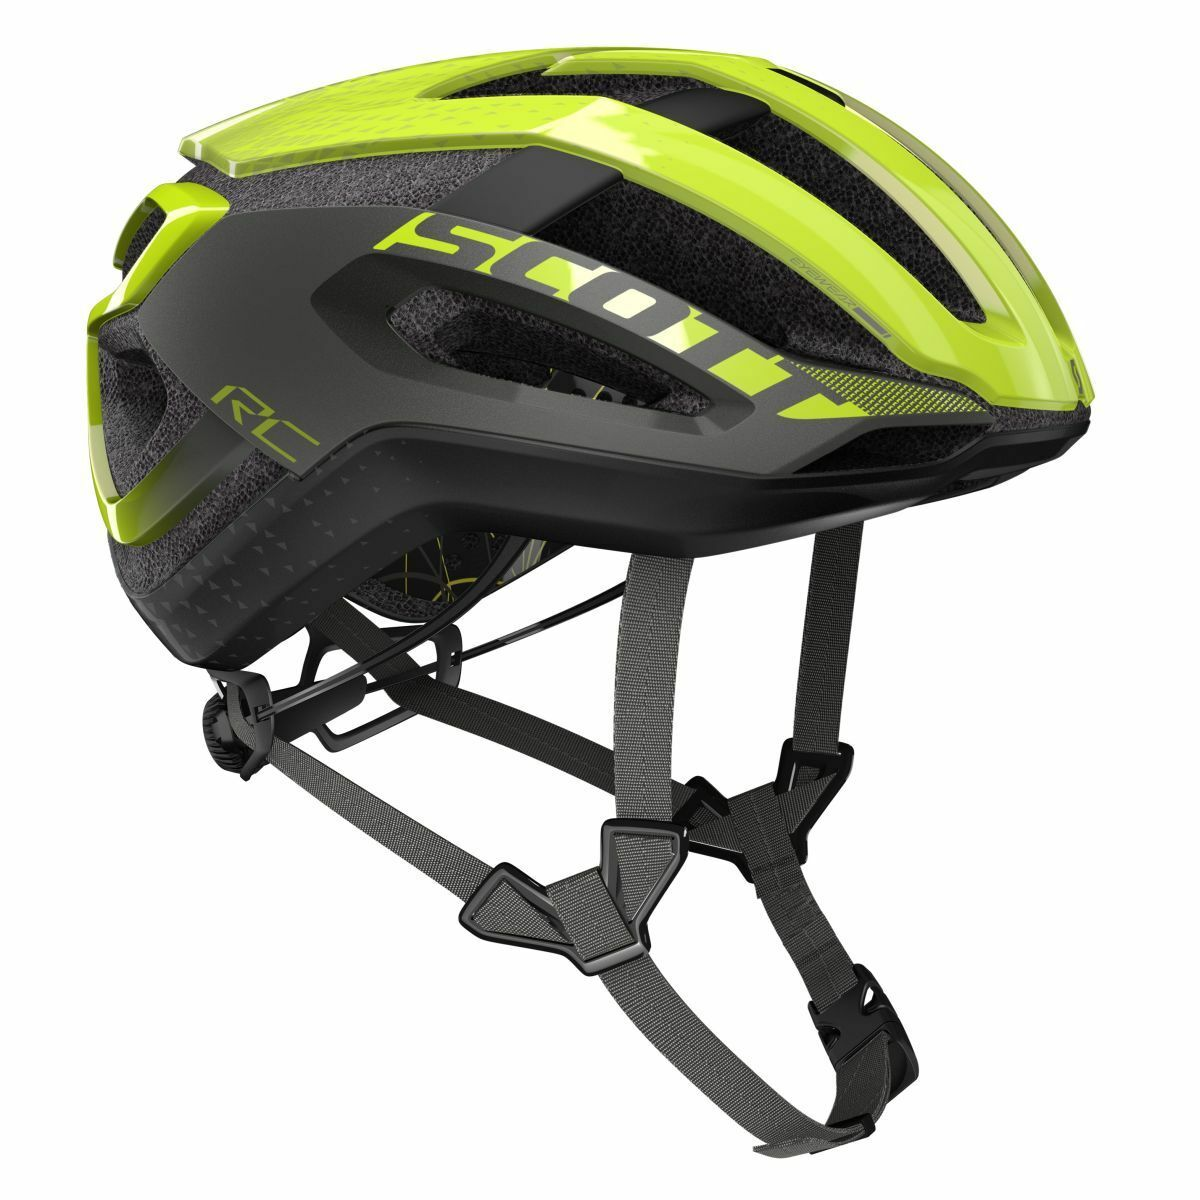 Scott Scott Scott Centric Plus Fahrrad Helm gelb grau 2019 6cfd76